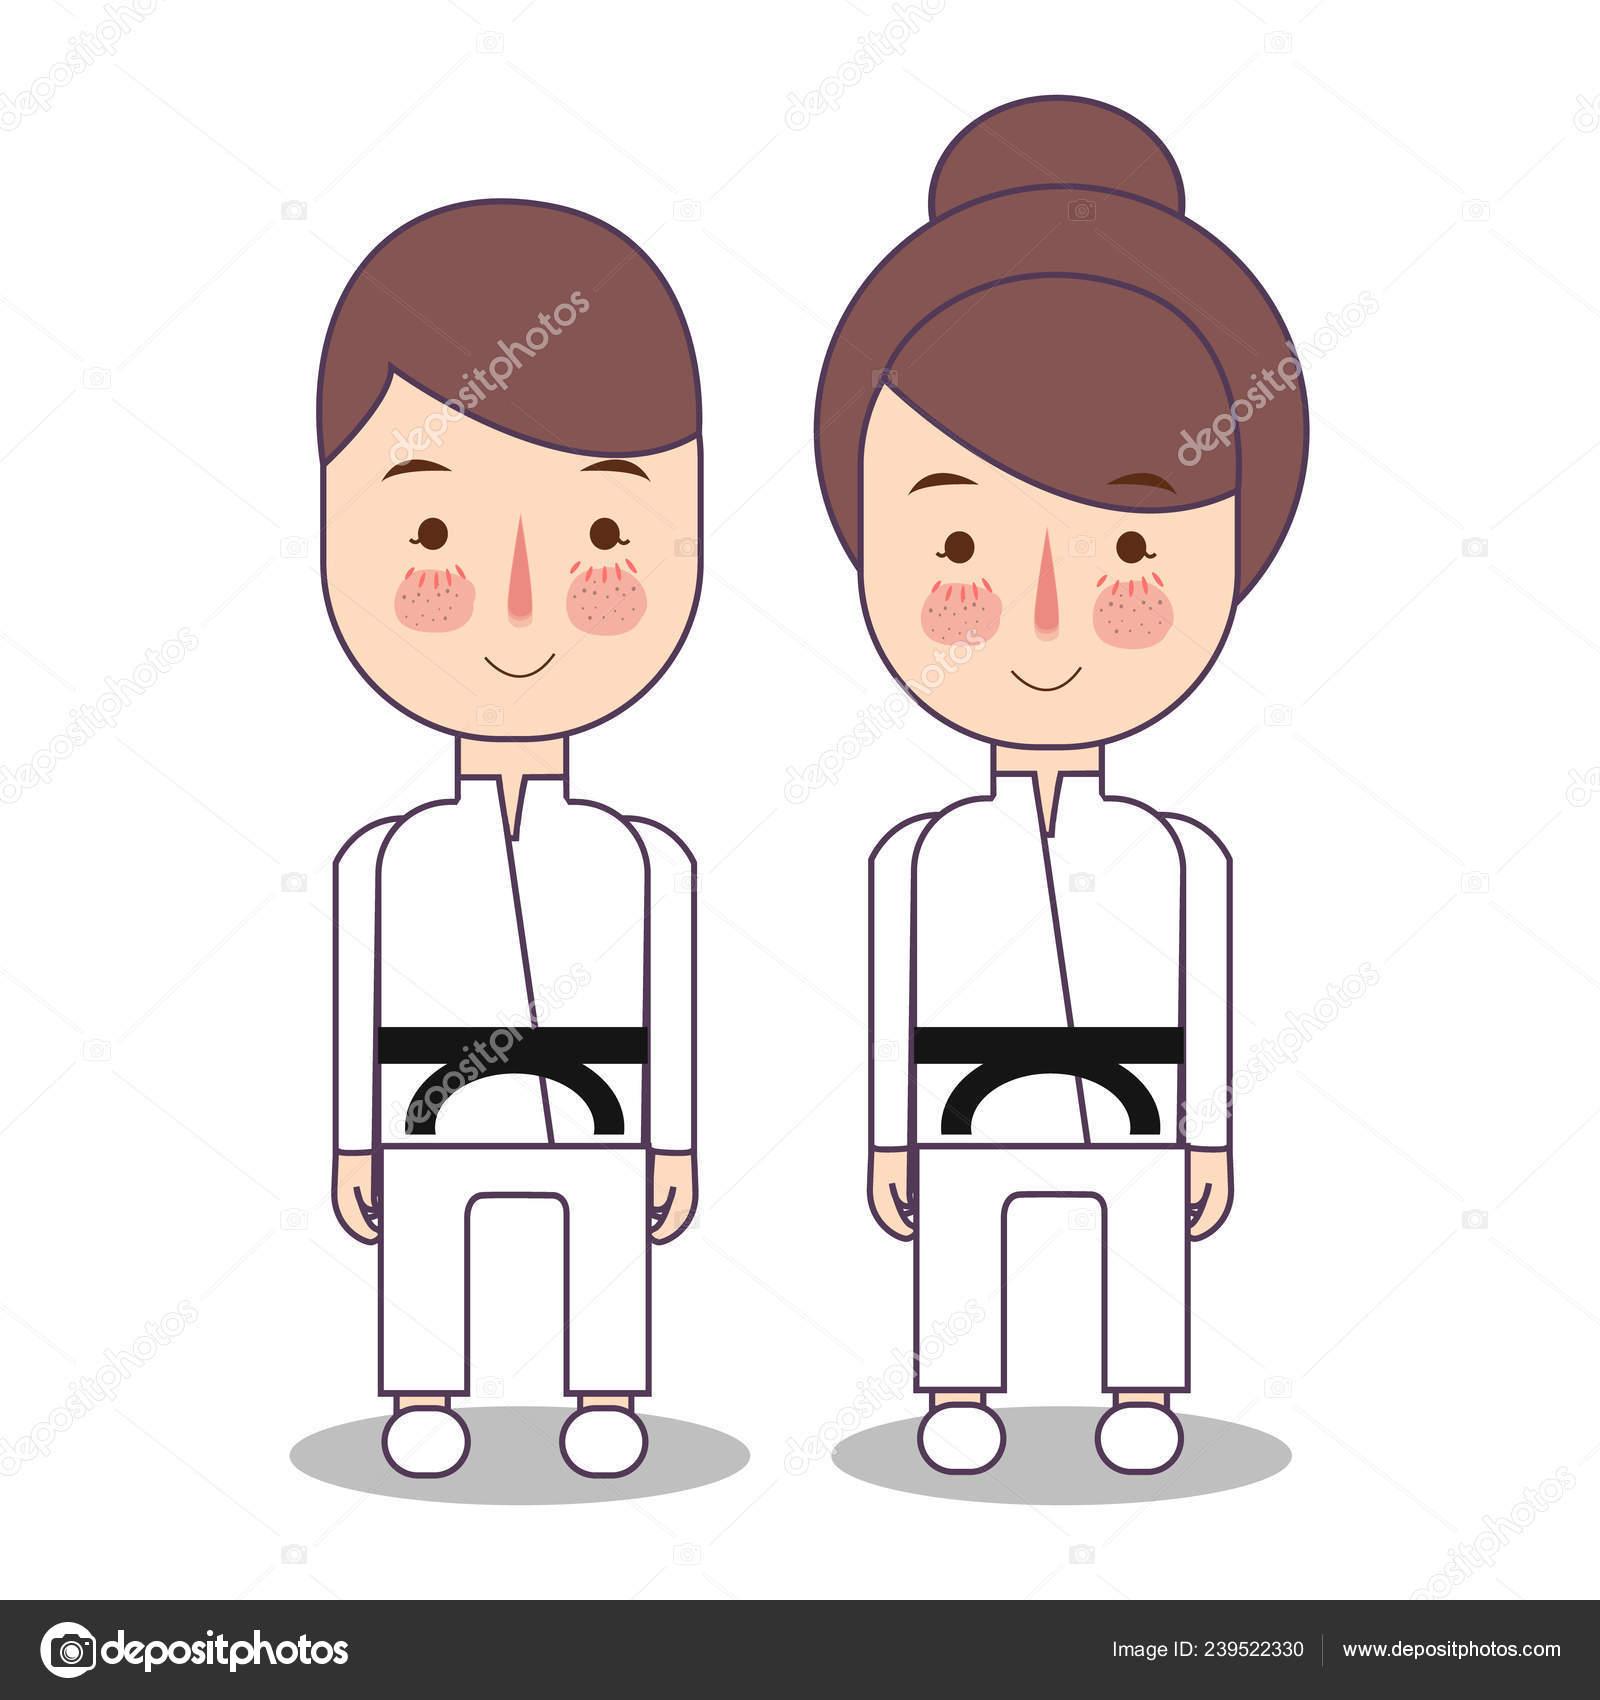 Karate Uniform Drawing Illustration Of Kids Wearing Karate Uniforms Black Belt Child Boy And Girls Judo Martial Art Costume Vector Drawing Illustration Stock Vector C Artnahla 239522330